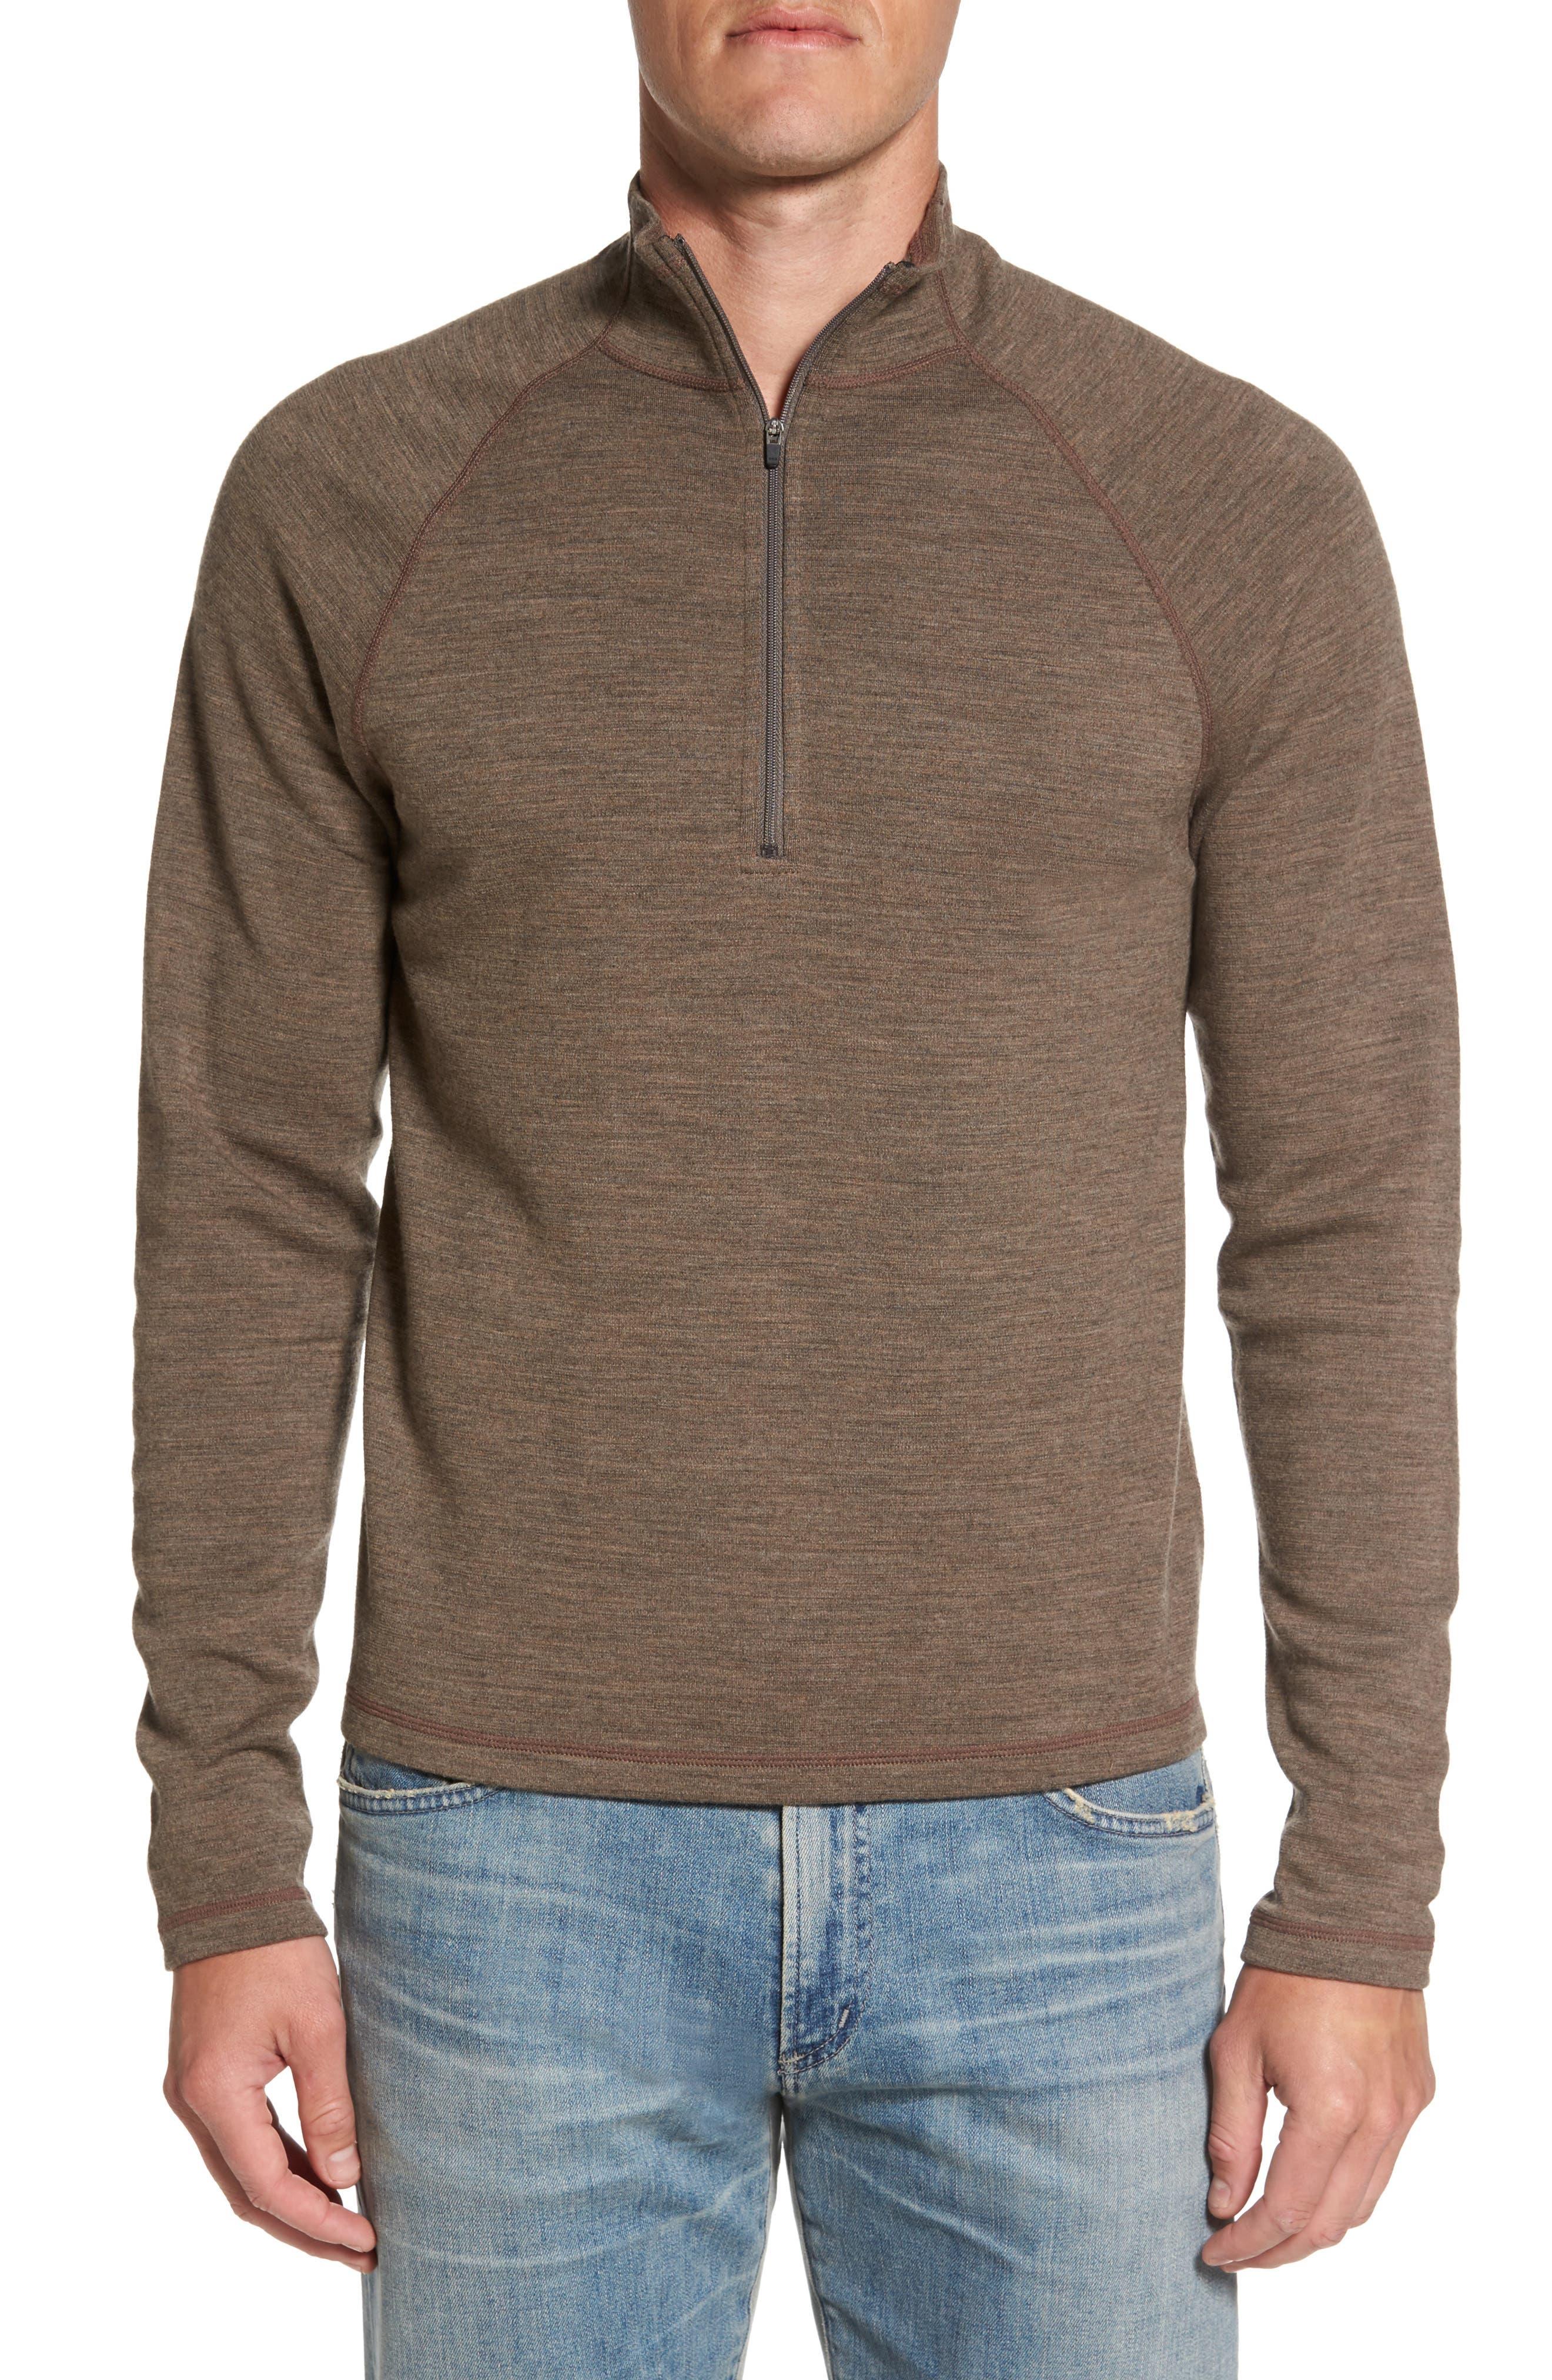 'Shak' Merino Wool Quarter Zip Top,                         Main,                         color, Dark Rye Heather